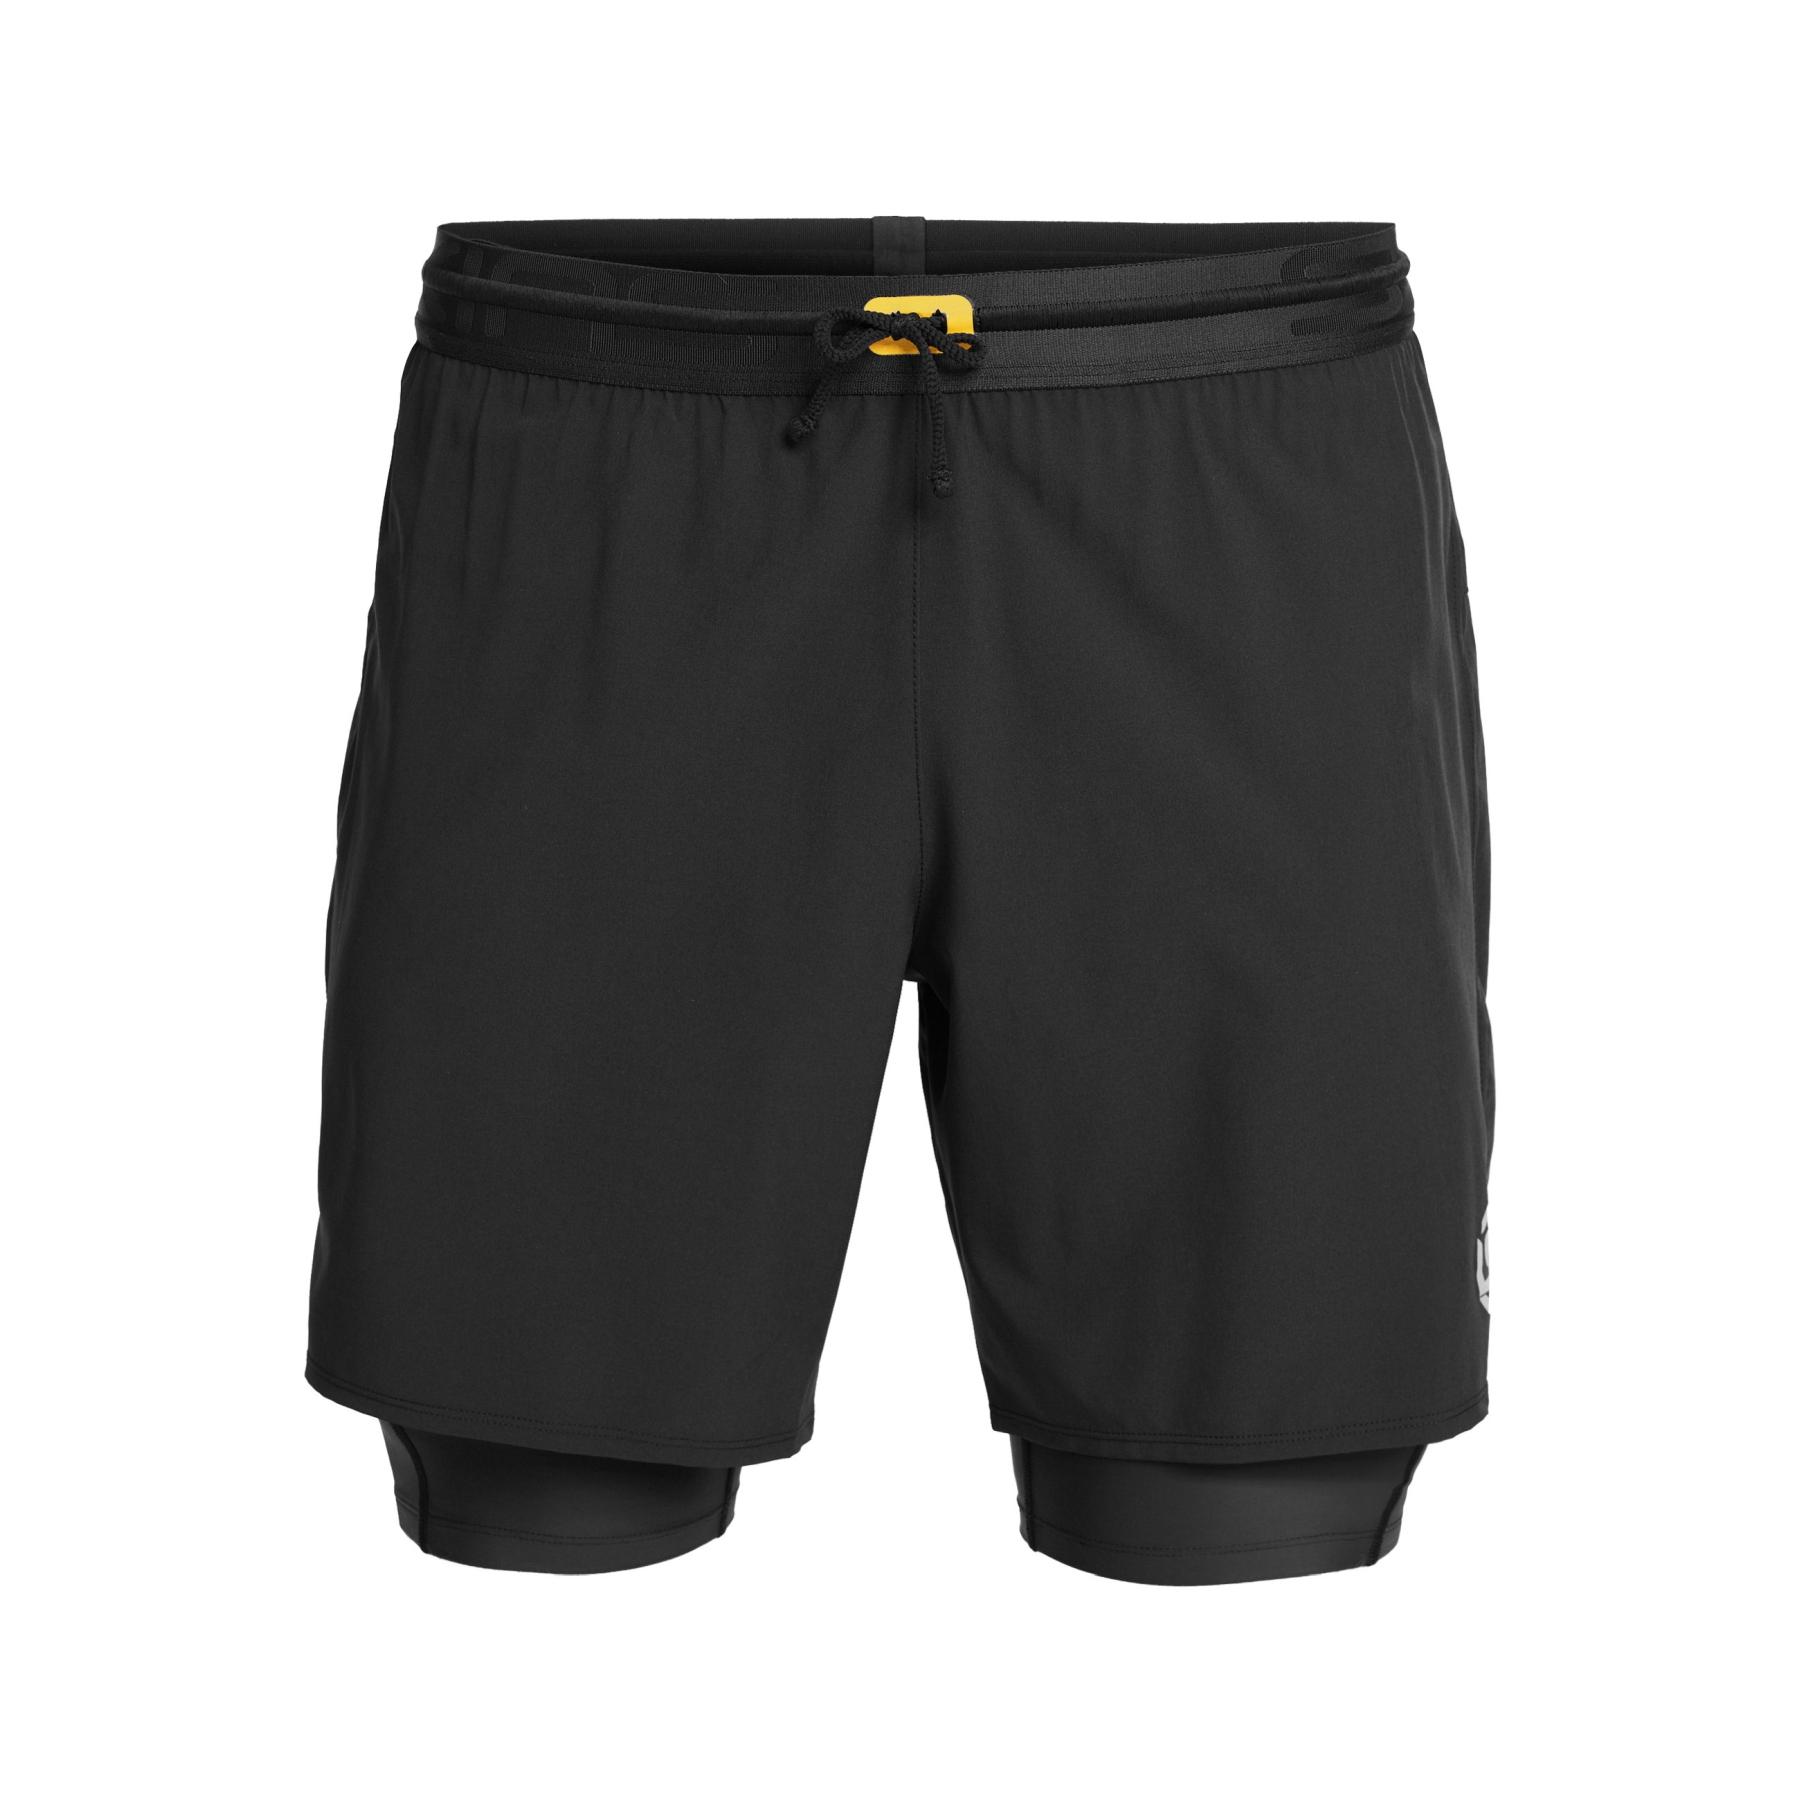 SKINS Compression 3-Series Superpose Shorts - Black